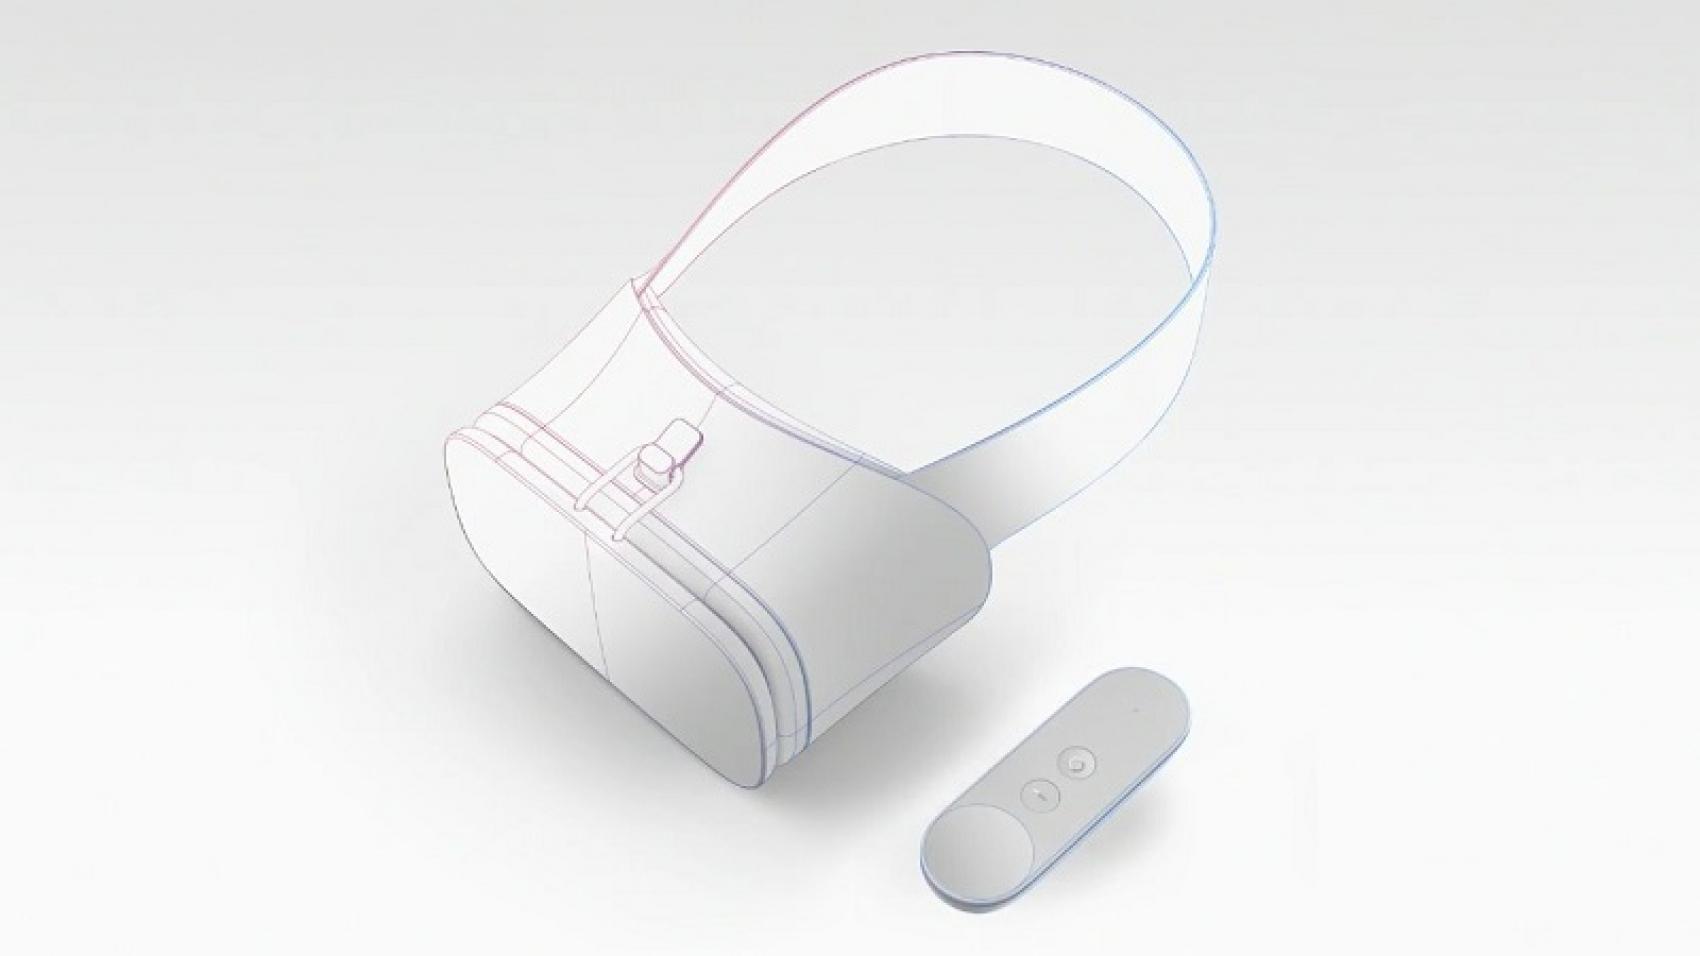 Google virtual reality